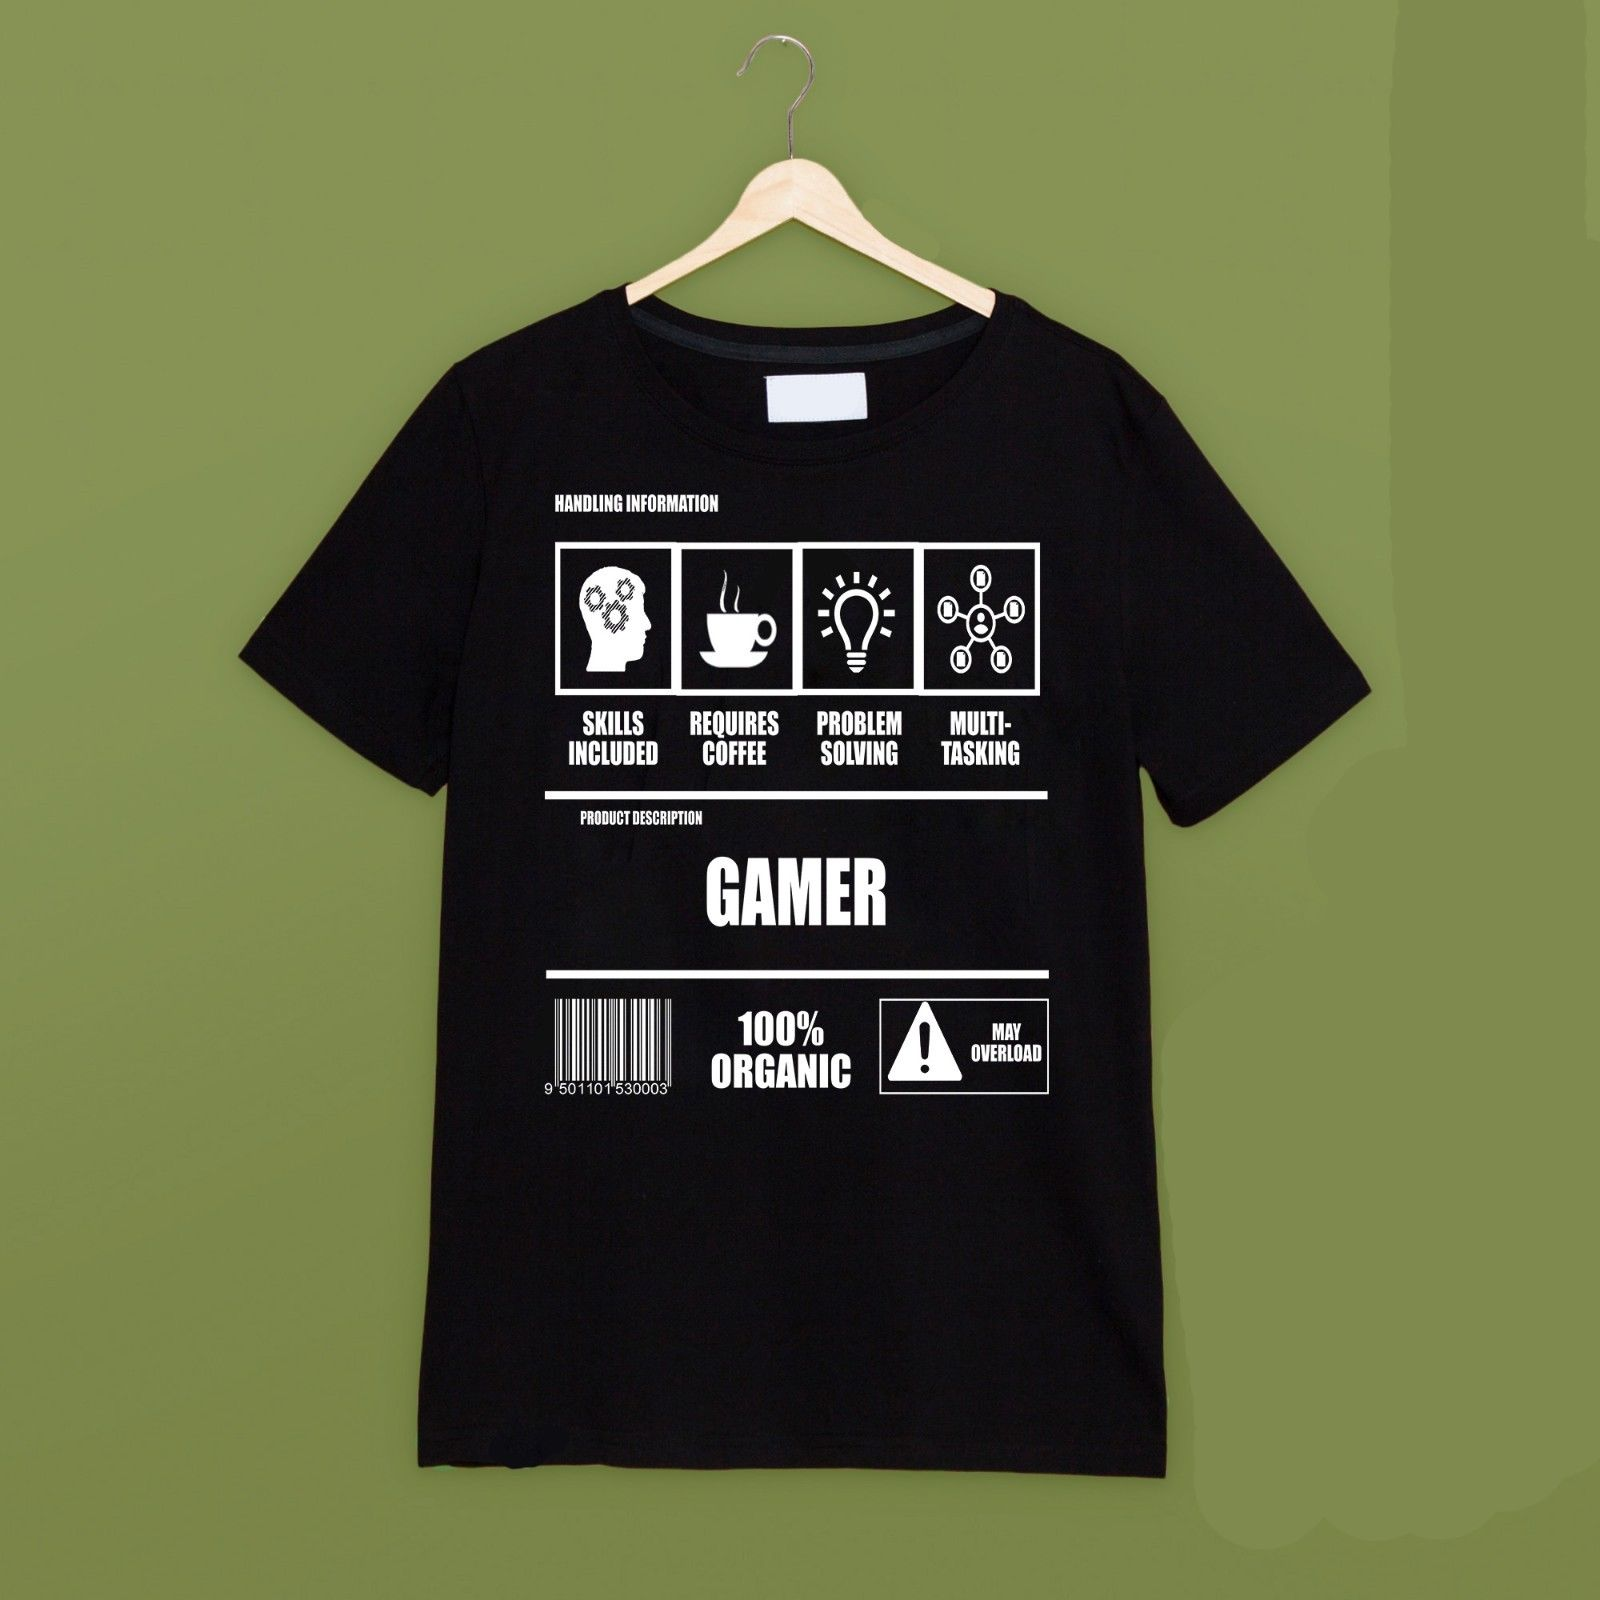 Roblox Custom Shirts Codes Agbu Hye Geen Roblox Police T Shirt Free Robux Codes 2019 Real